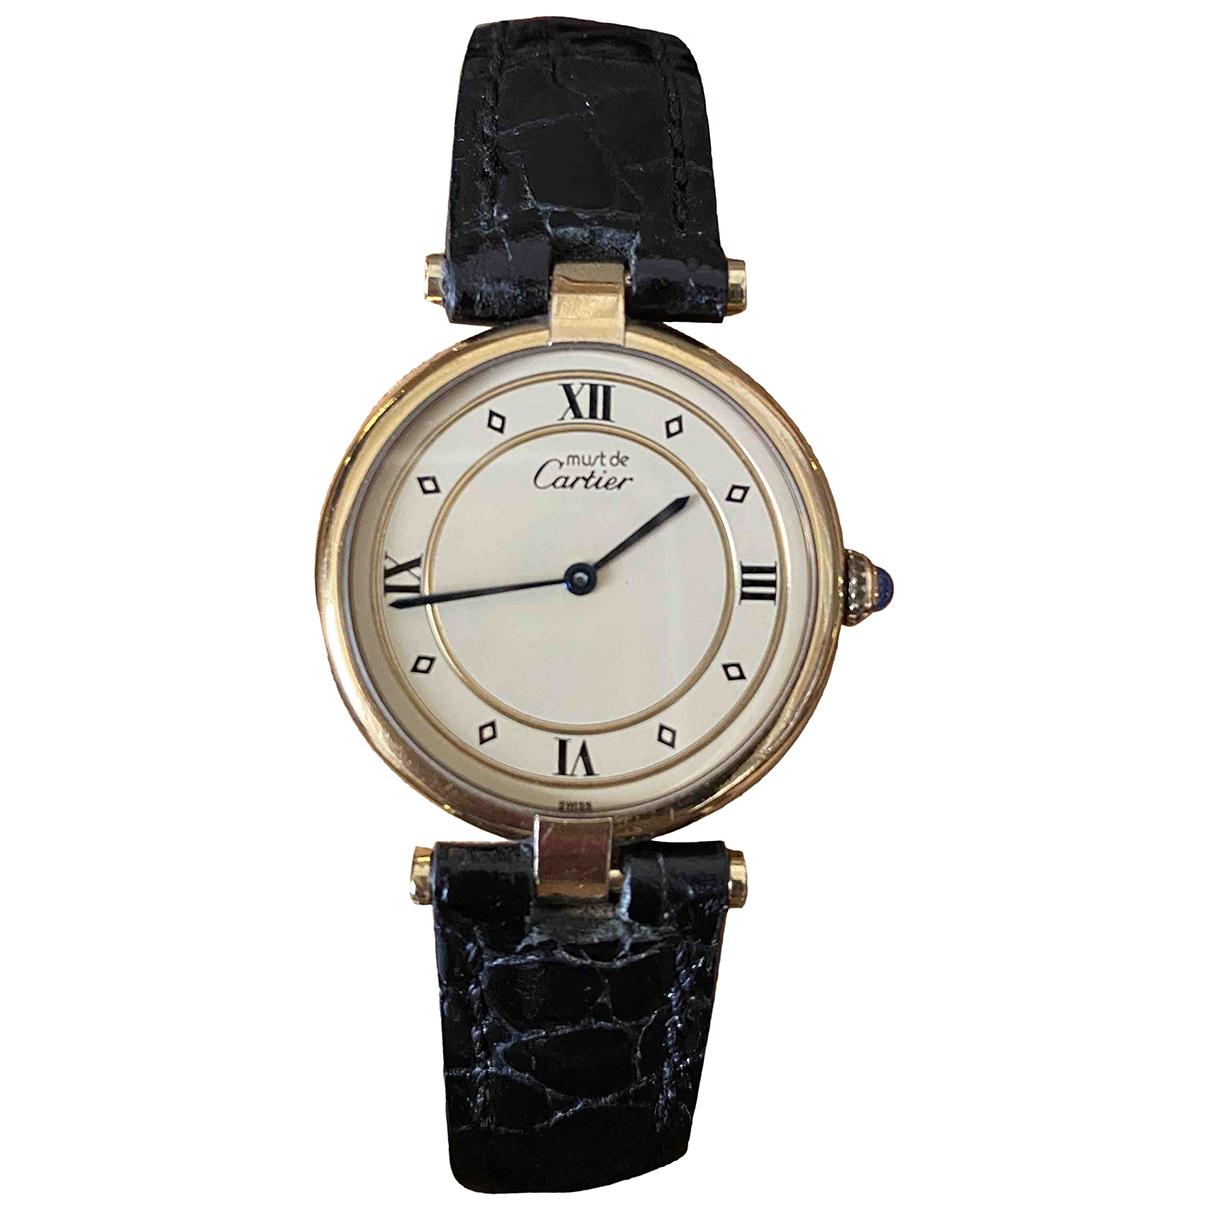 Reloj Must Vendome  de Bermellon Cartier